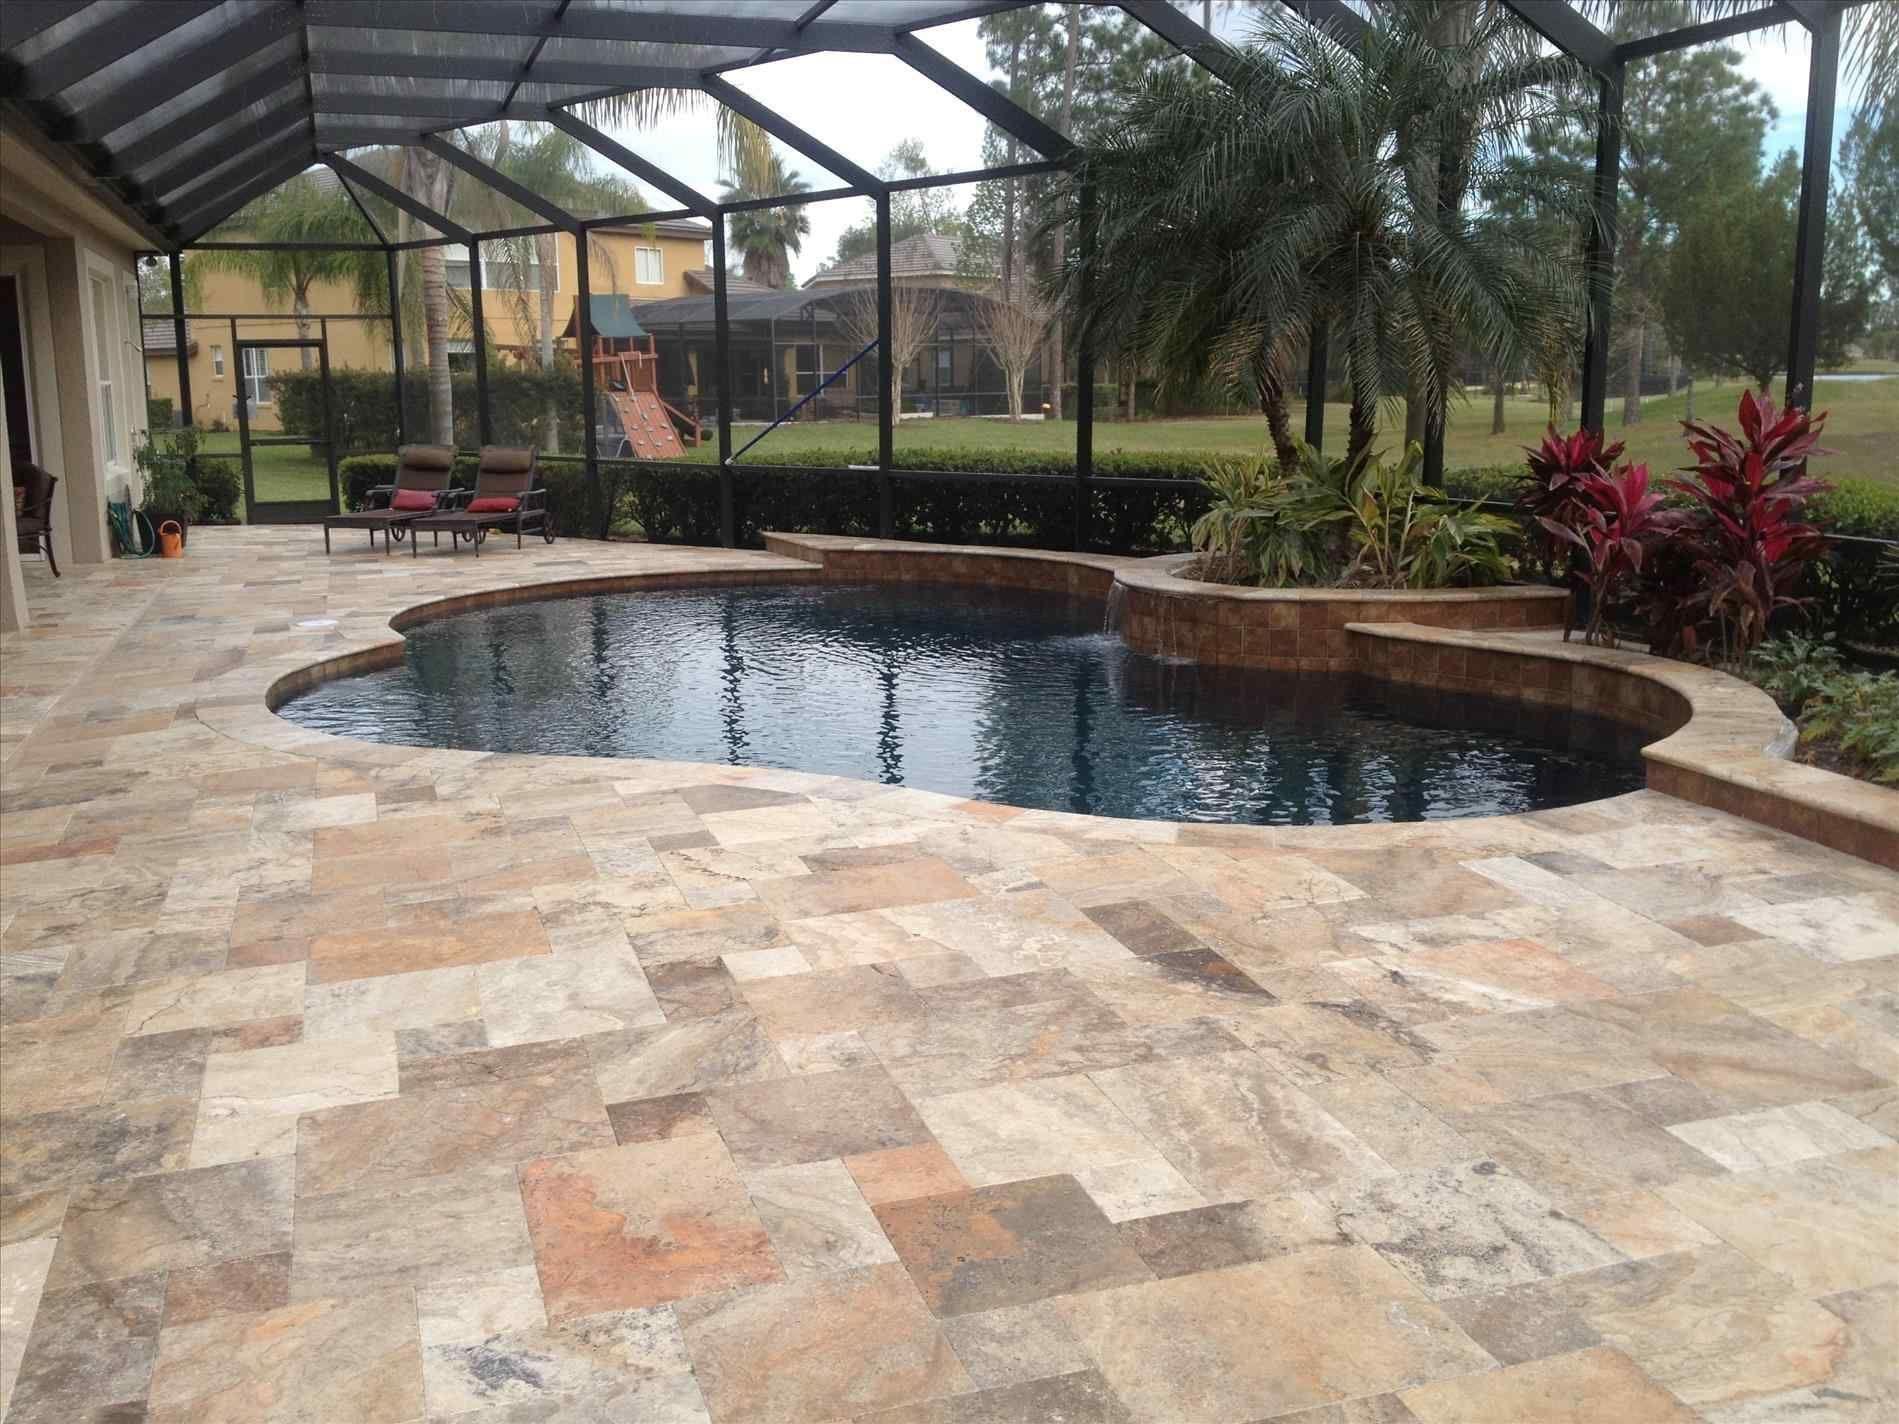 15 Incredible And Easy Diy Patio Floor Ideas Patio Tiles Outdoor Stone Stone Tile Flooring